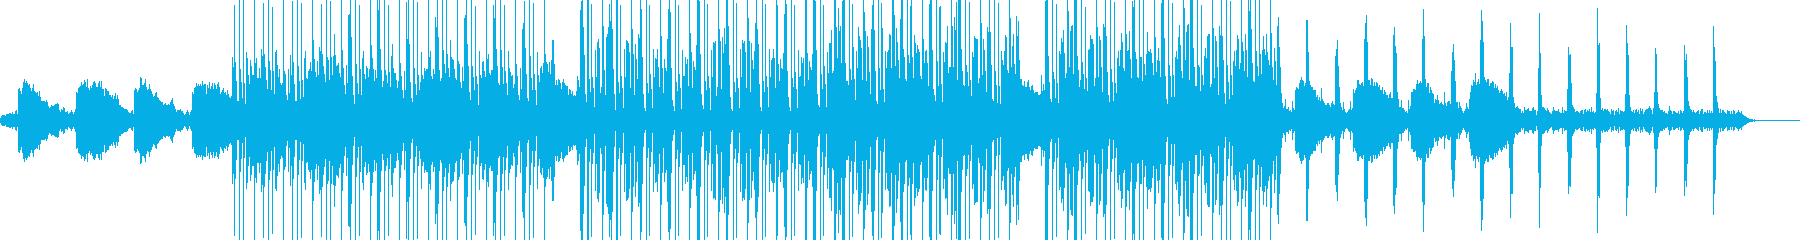 Encounterの再生済みの波形